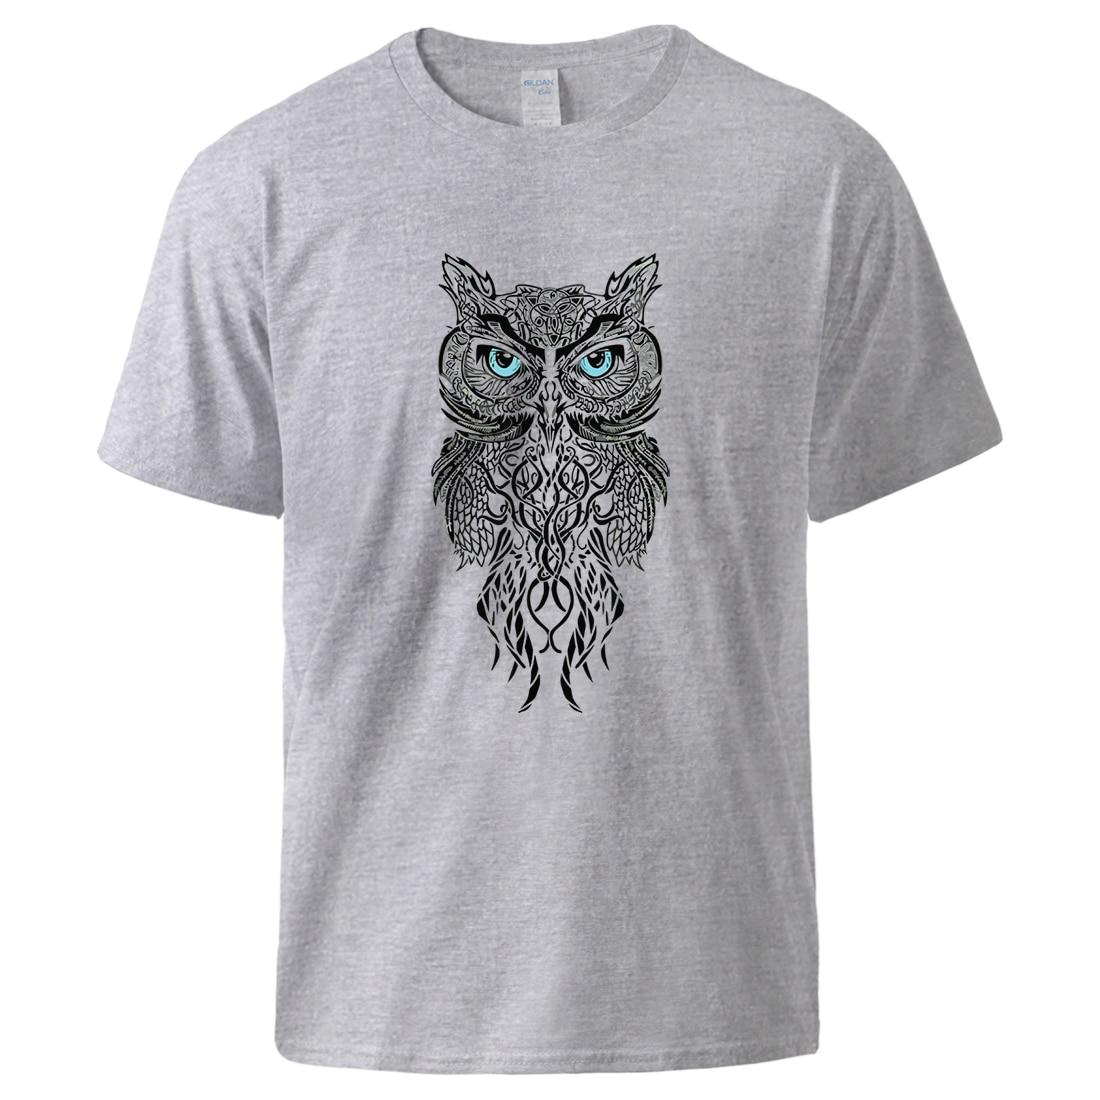 Cool Owl Tshirts 2020 New Arrival Cotton Short Sleeve T Shirts Casual Short Sleeve Sportswear Man Summer Cool Fashion T Shirts